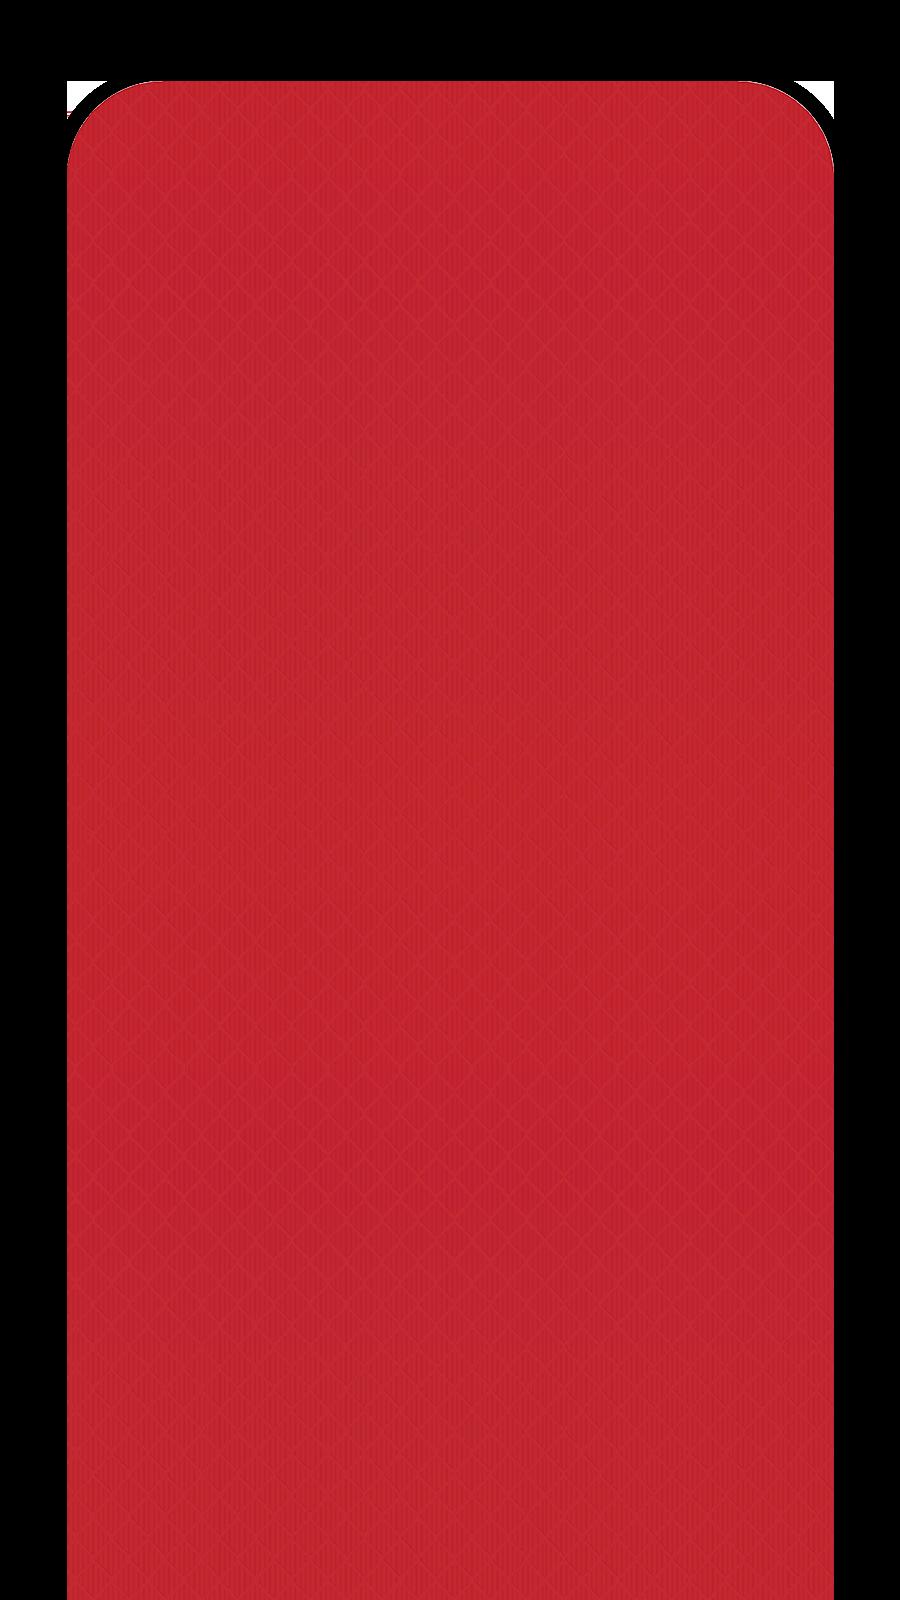 3M™ 4092 Series Red Diamond Grade Sheeting